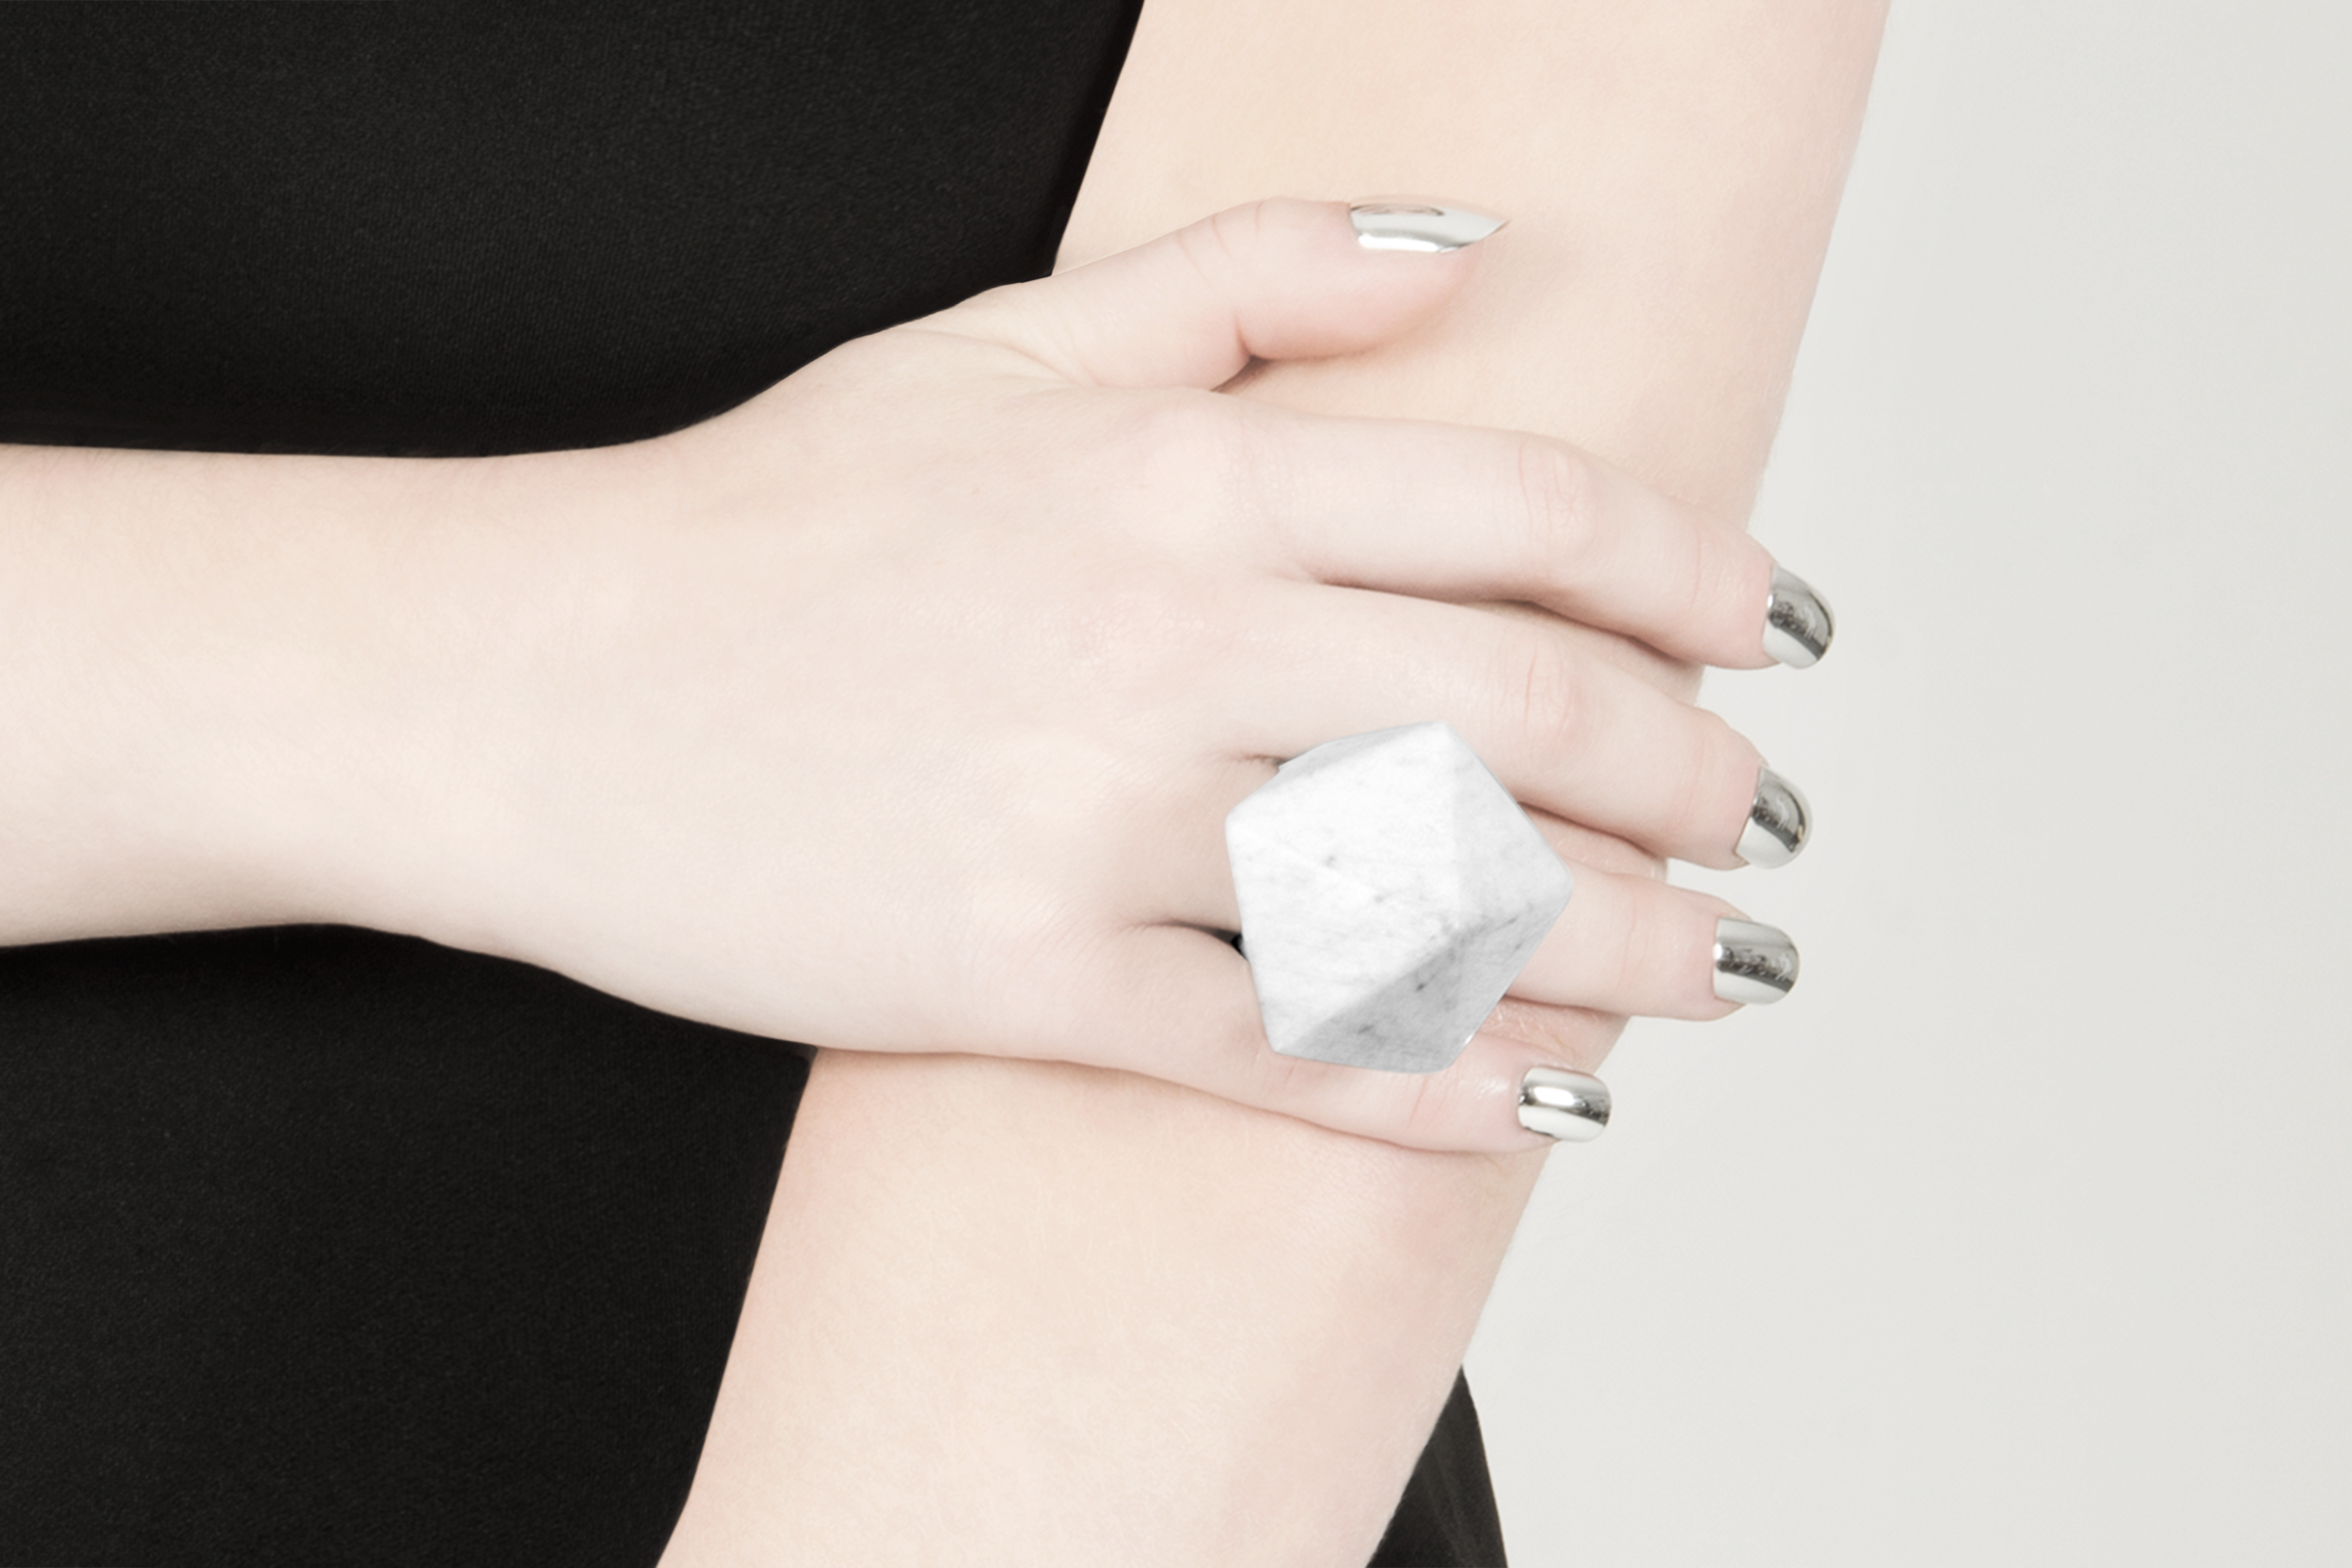 Chloe_Ring_02_Digital Marble_Carrara_Space Junk_2015.png